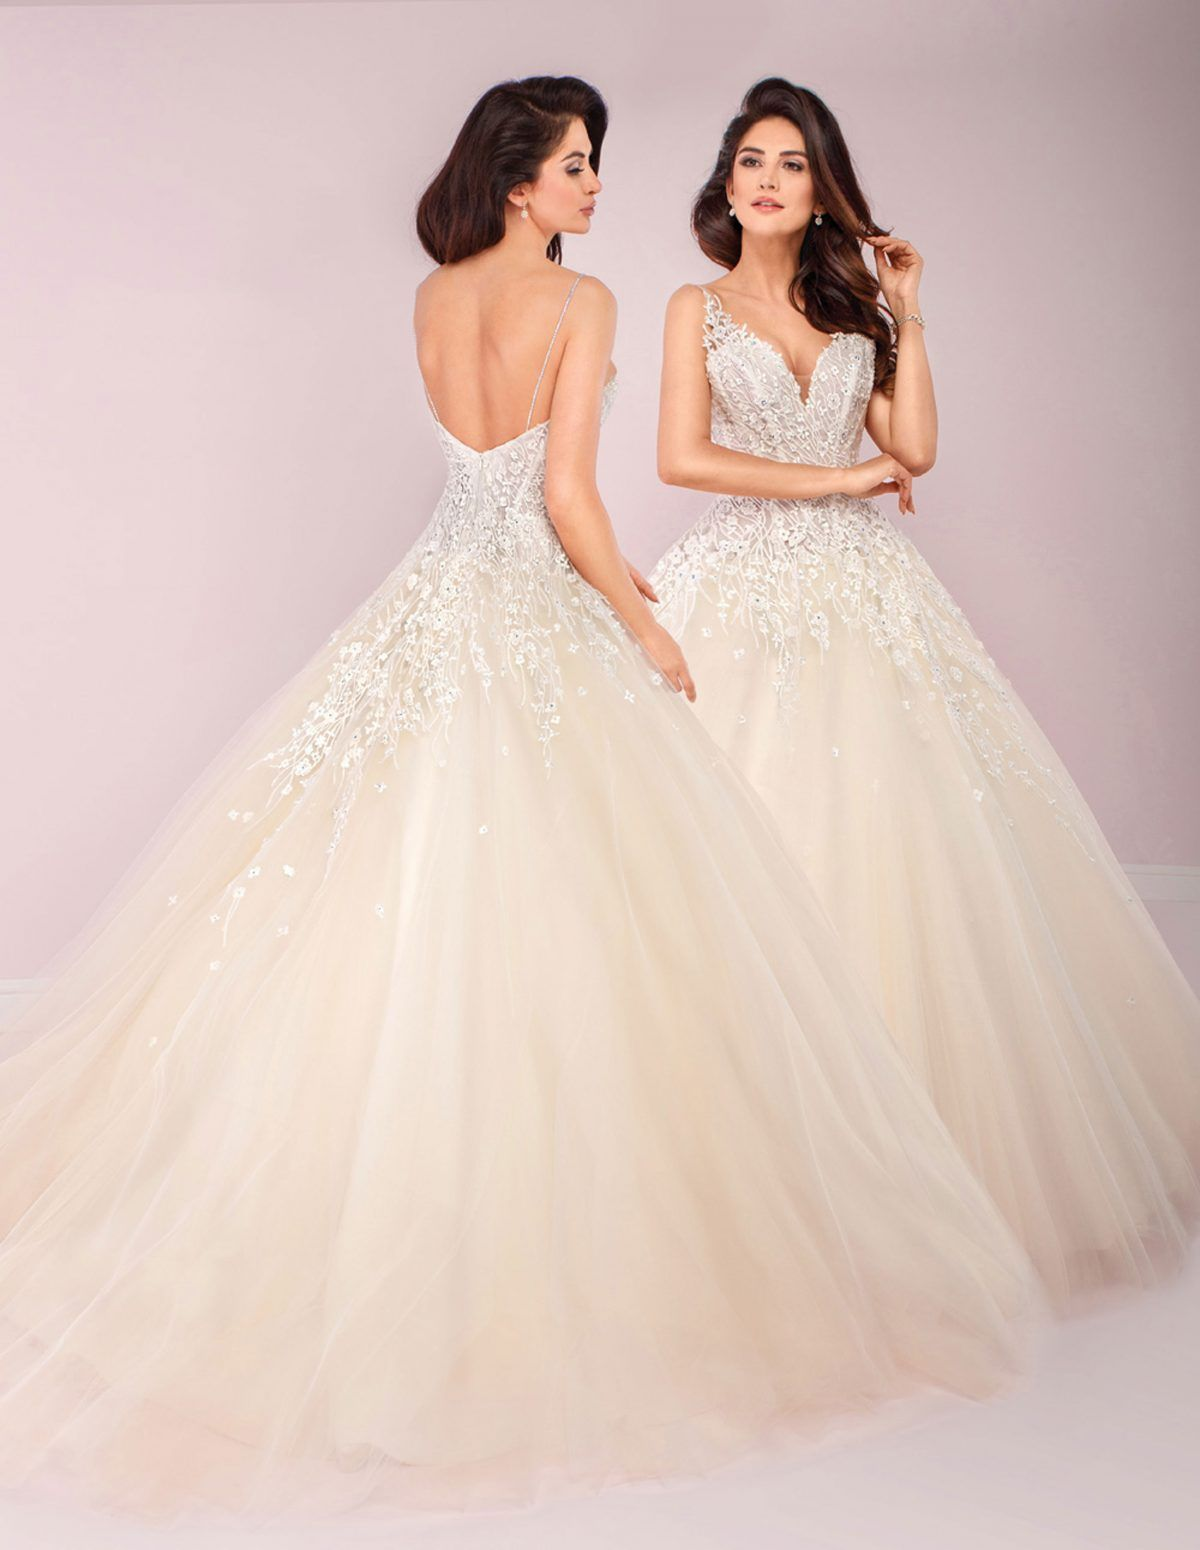 Agora 15-15 Brautkleid A-Linie Hochzeitskleid Prinzessin Brautmode